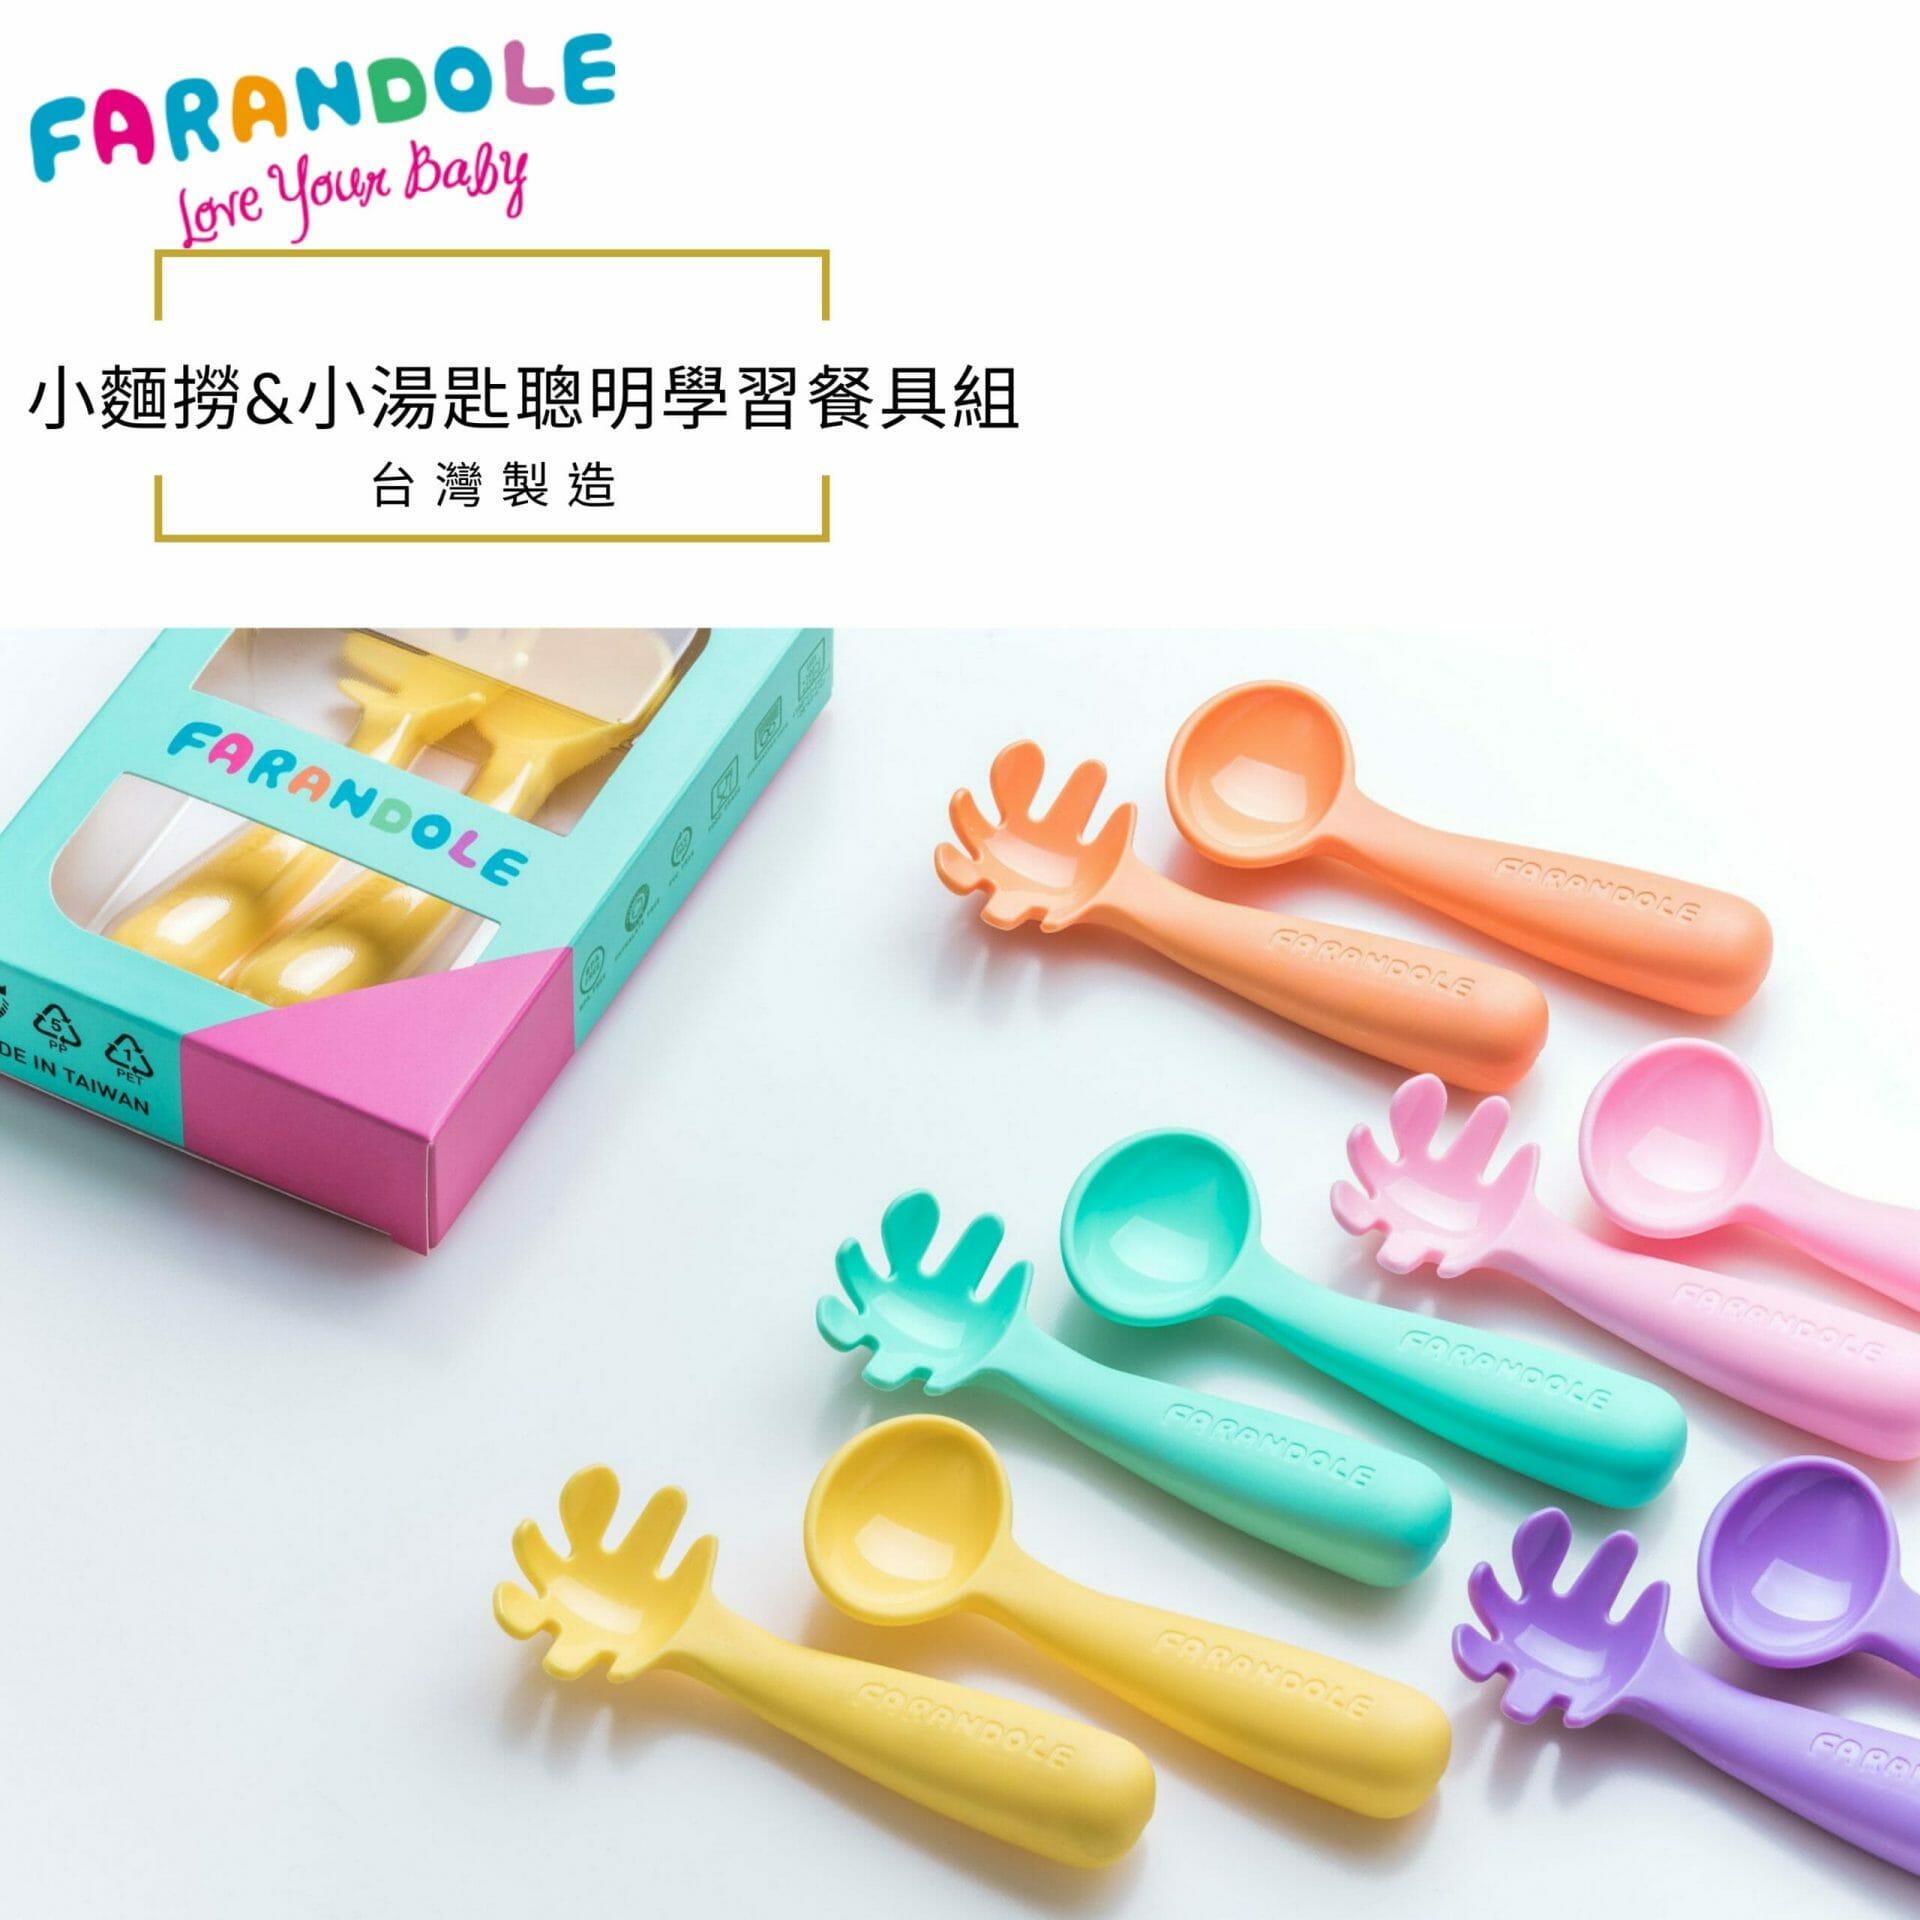 Farandole小麵撈 & 小湯匙聰明學習餐具組 - 11